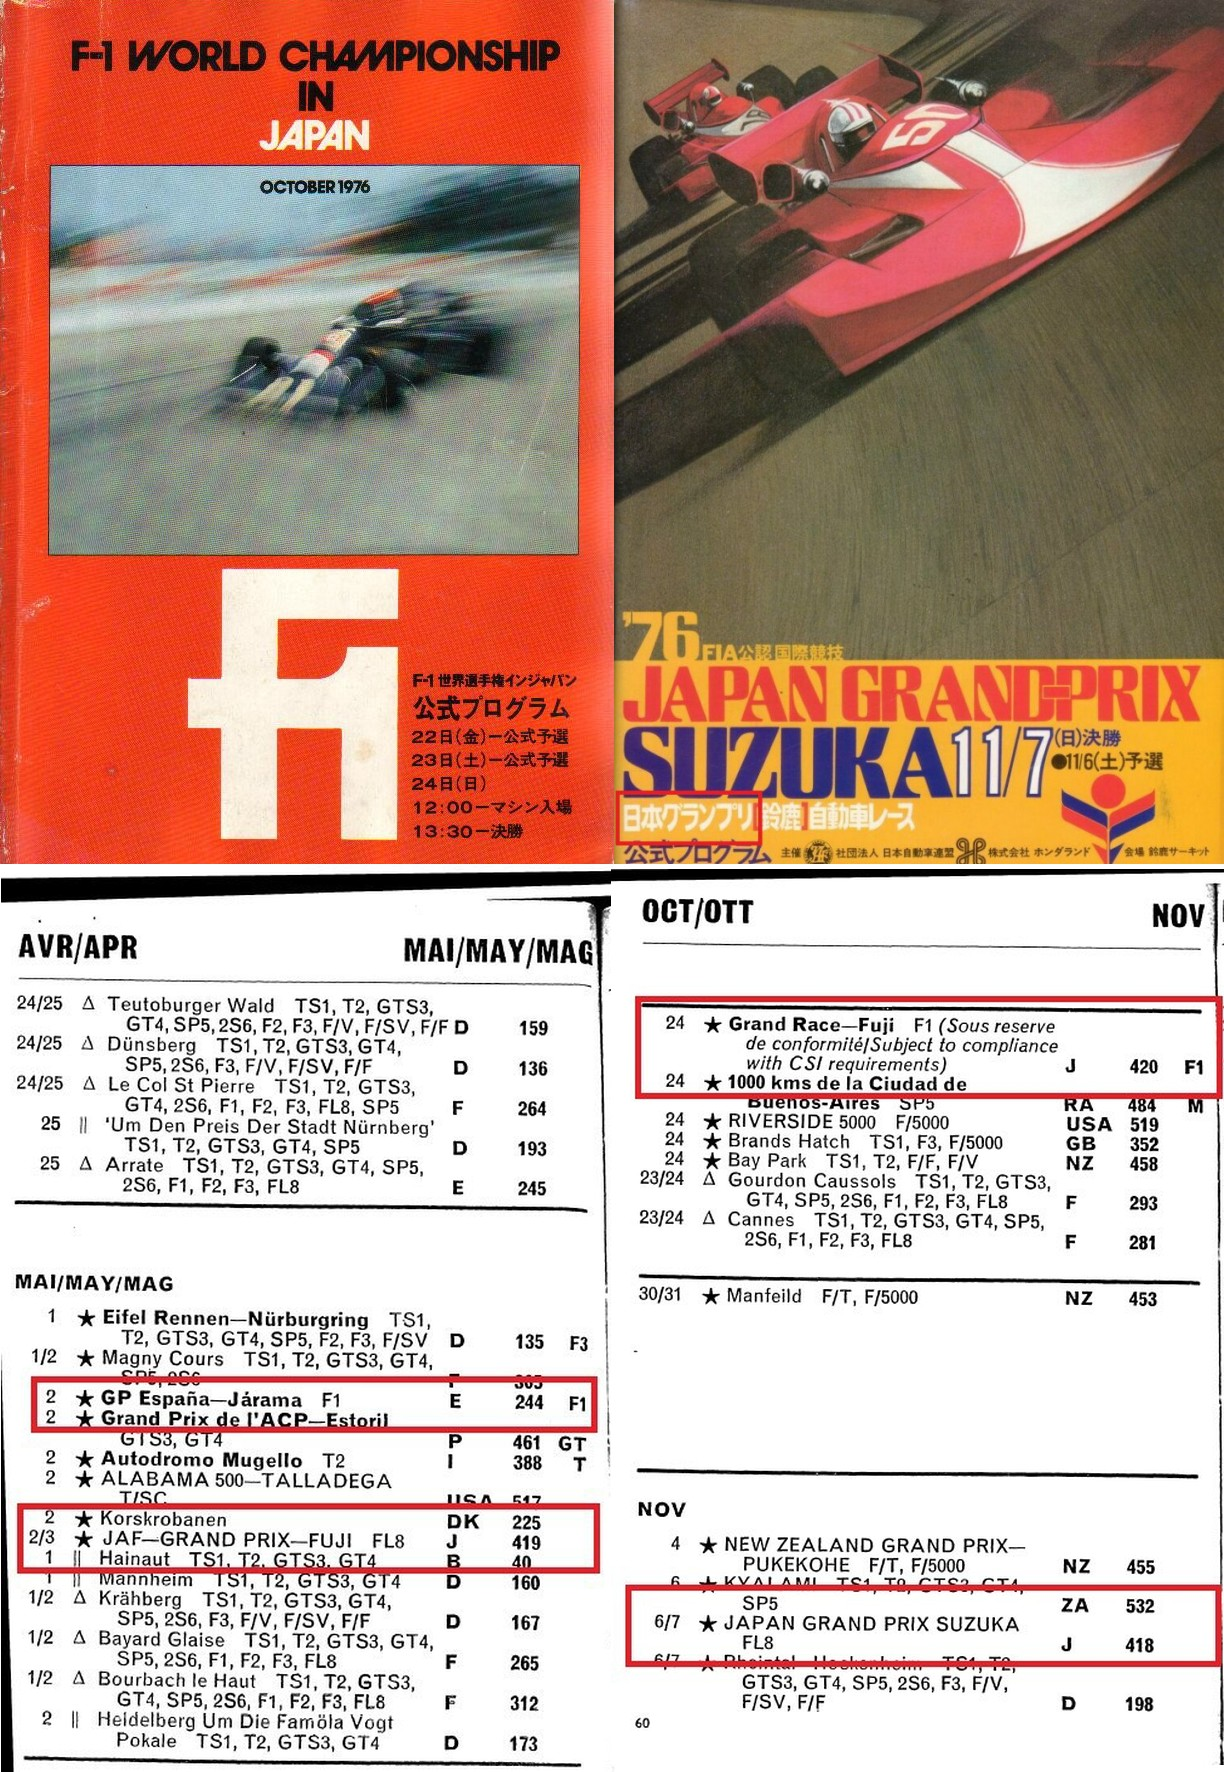 Японский гран-при и гонка Ф1 1976 года